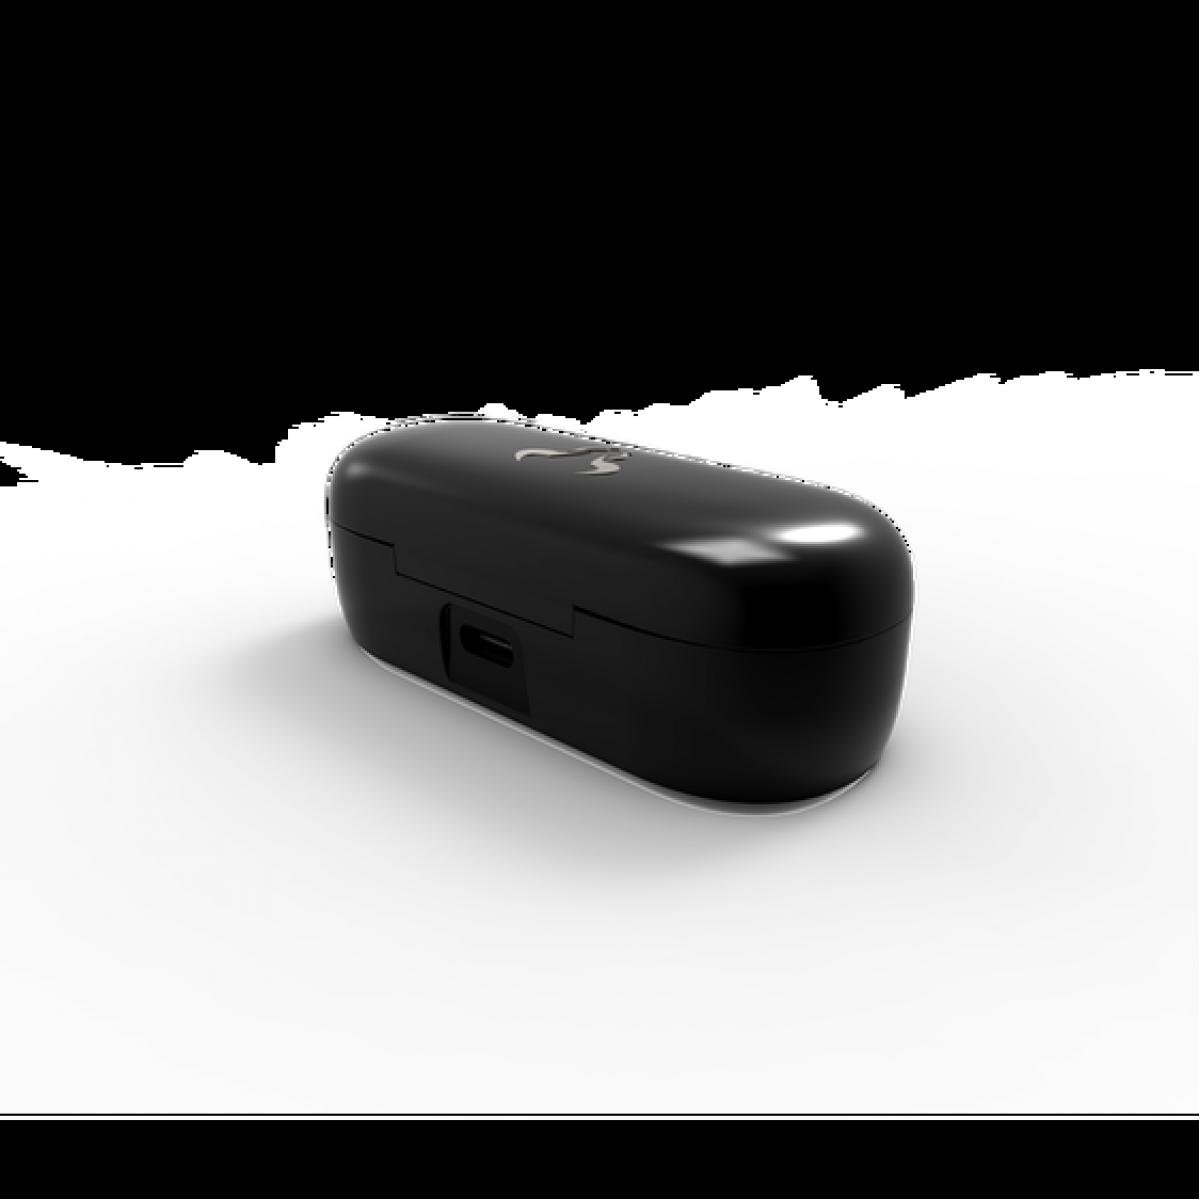 Fone de Ouvido Bluetooth Riotoro RPOD Classic, Black, AR-20B